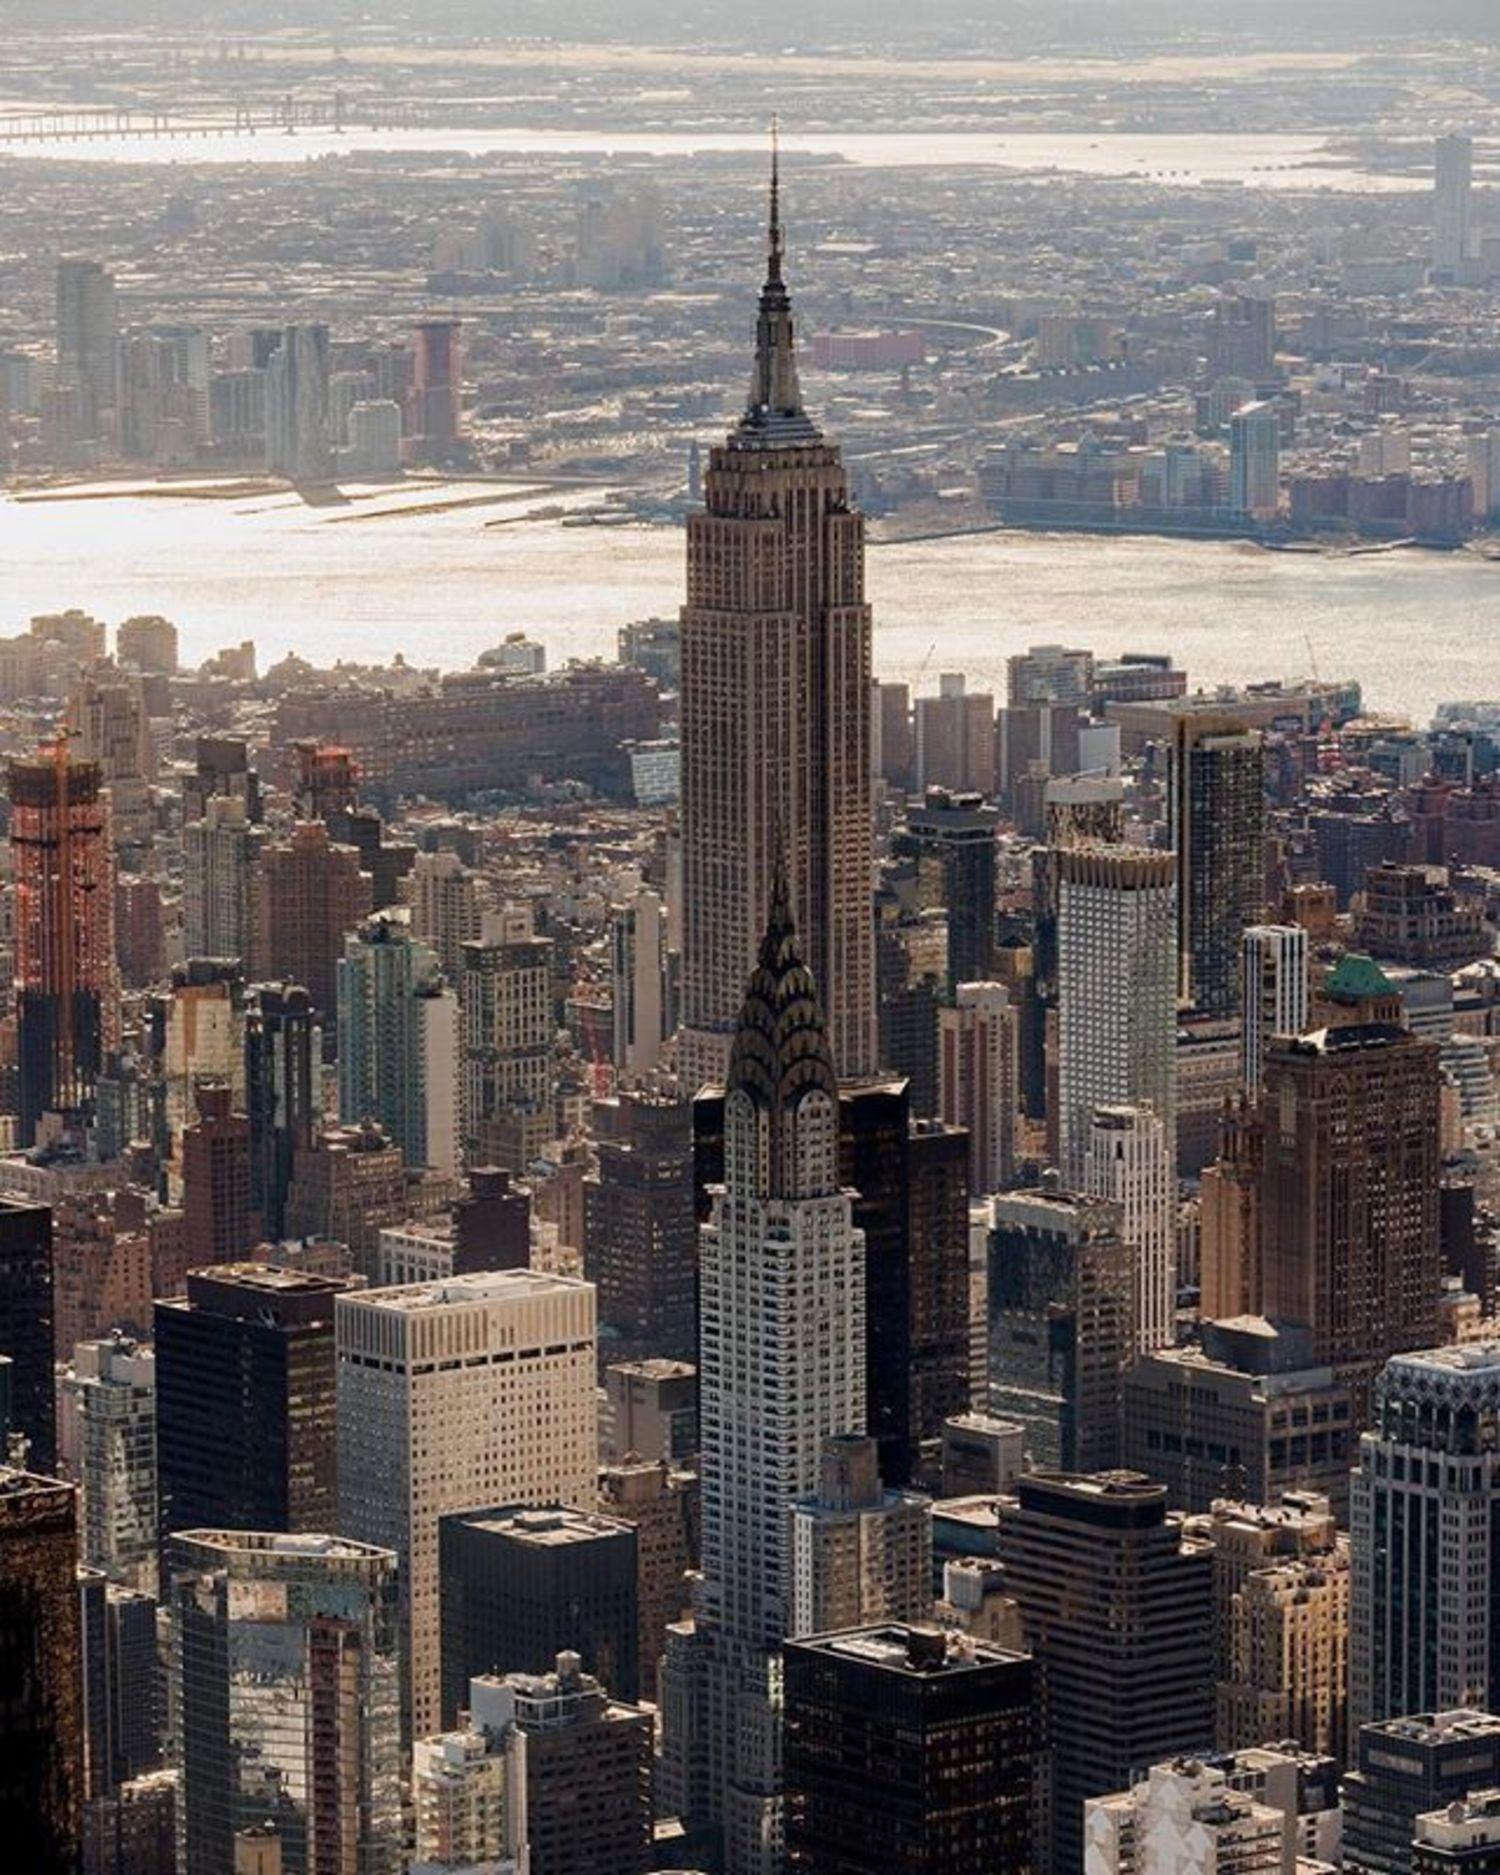 Empire State Building, New York, New York. Photo via @flynyon #viewingnyc #newyorkcity #newyork #nyc #empirestatebuilding